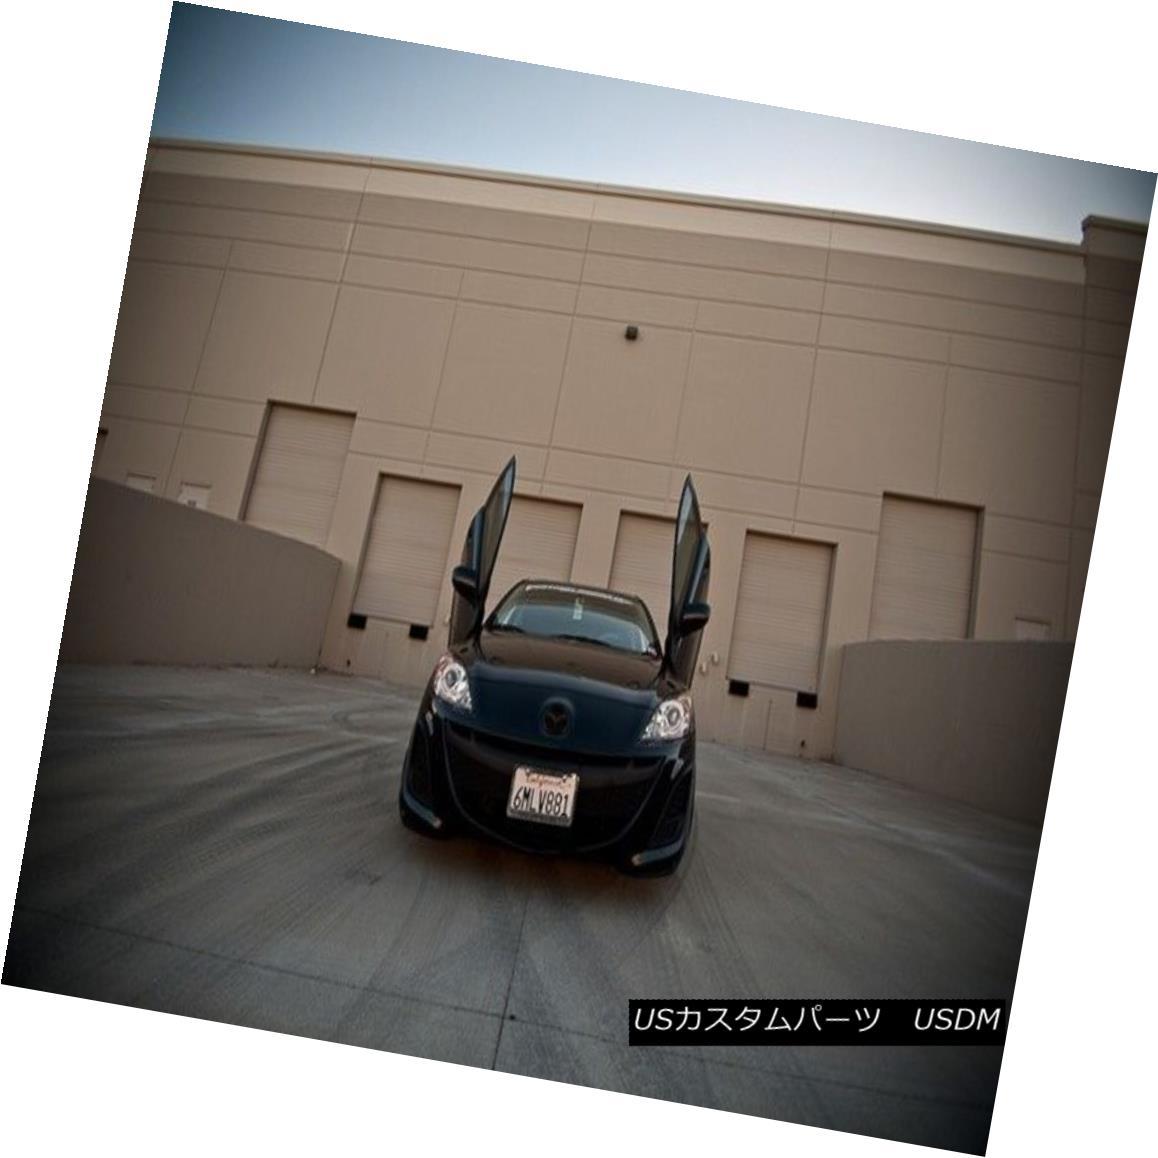 09 10 11 12 13 Mazda3 Rear Cross Floor Strut Bar Mazda 3 BL